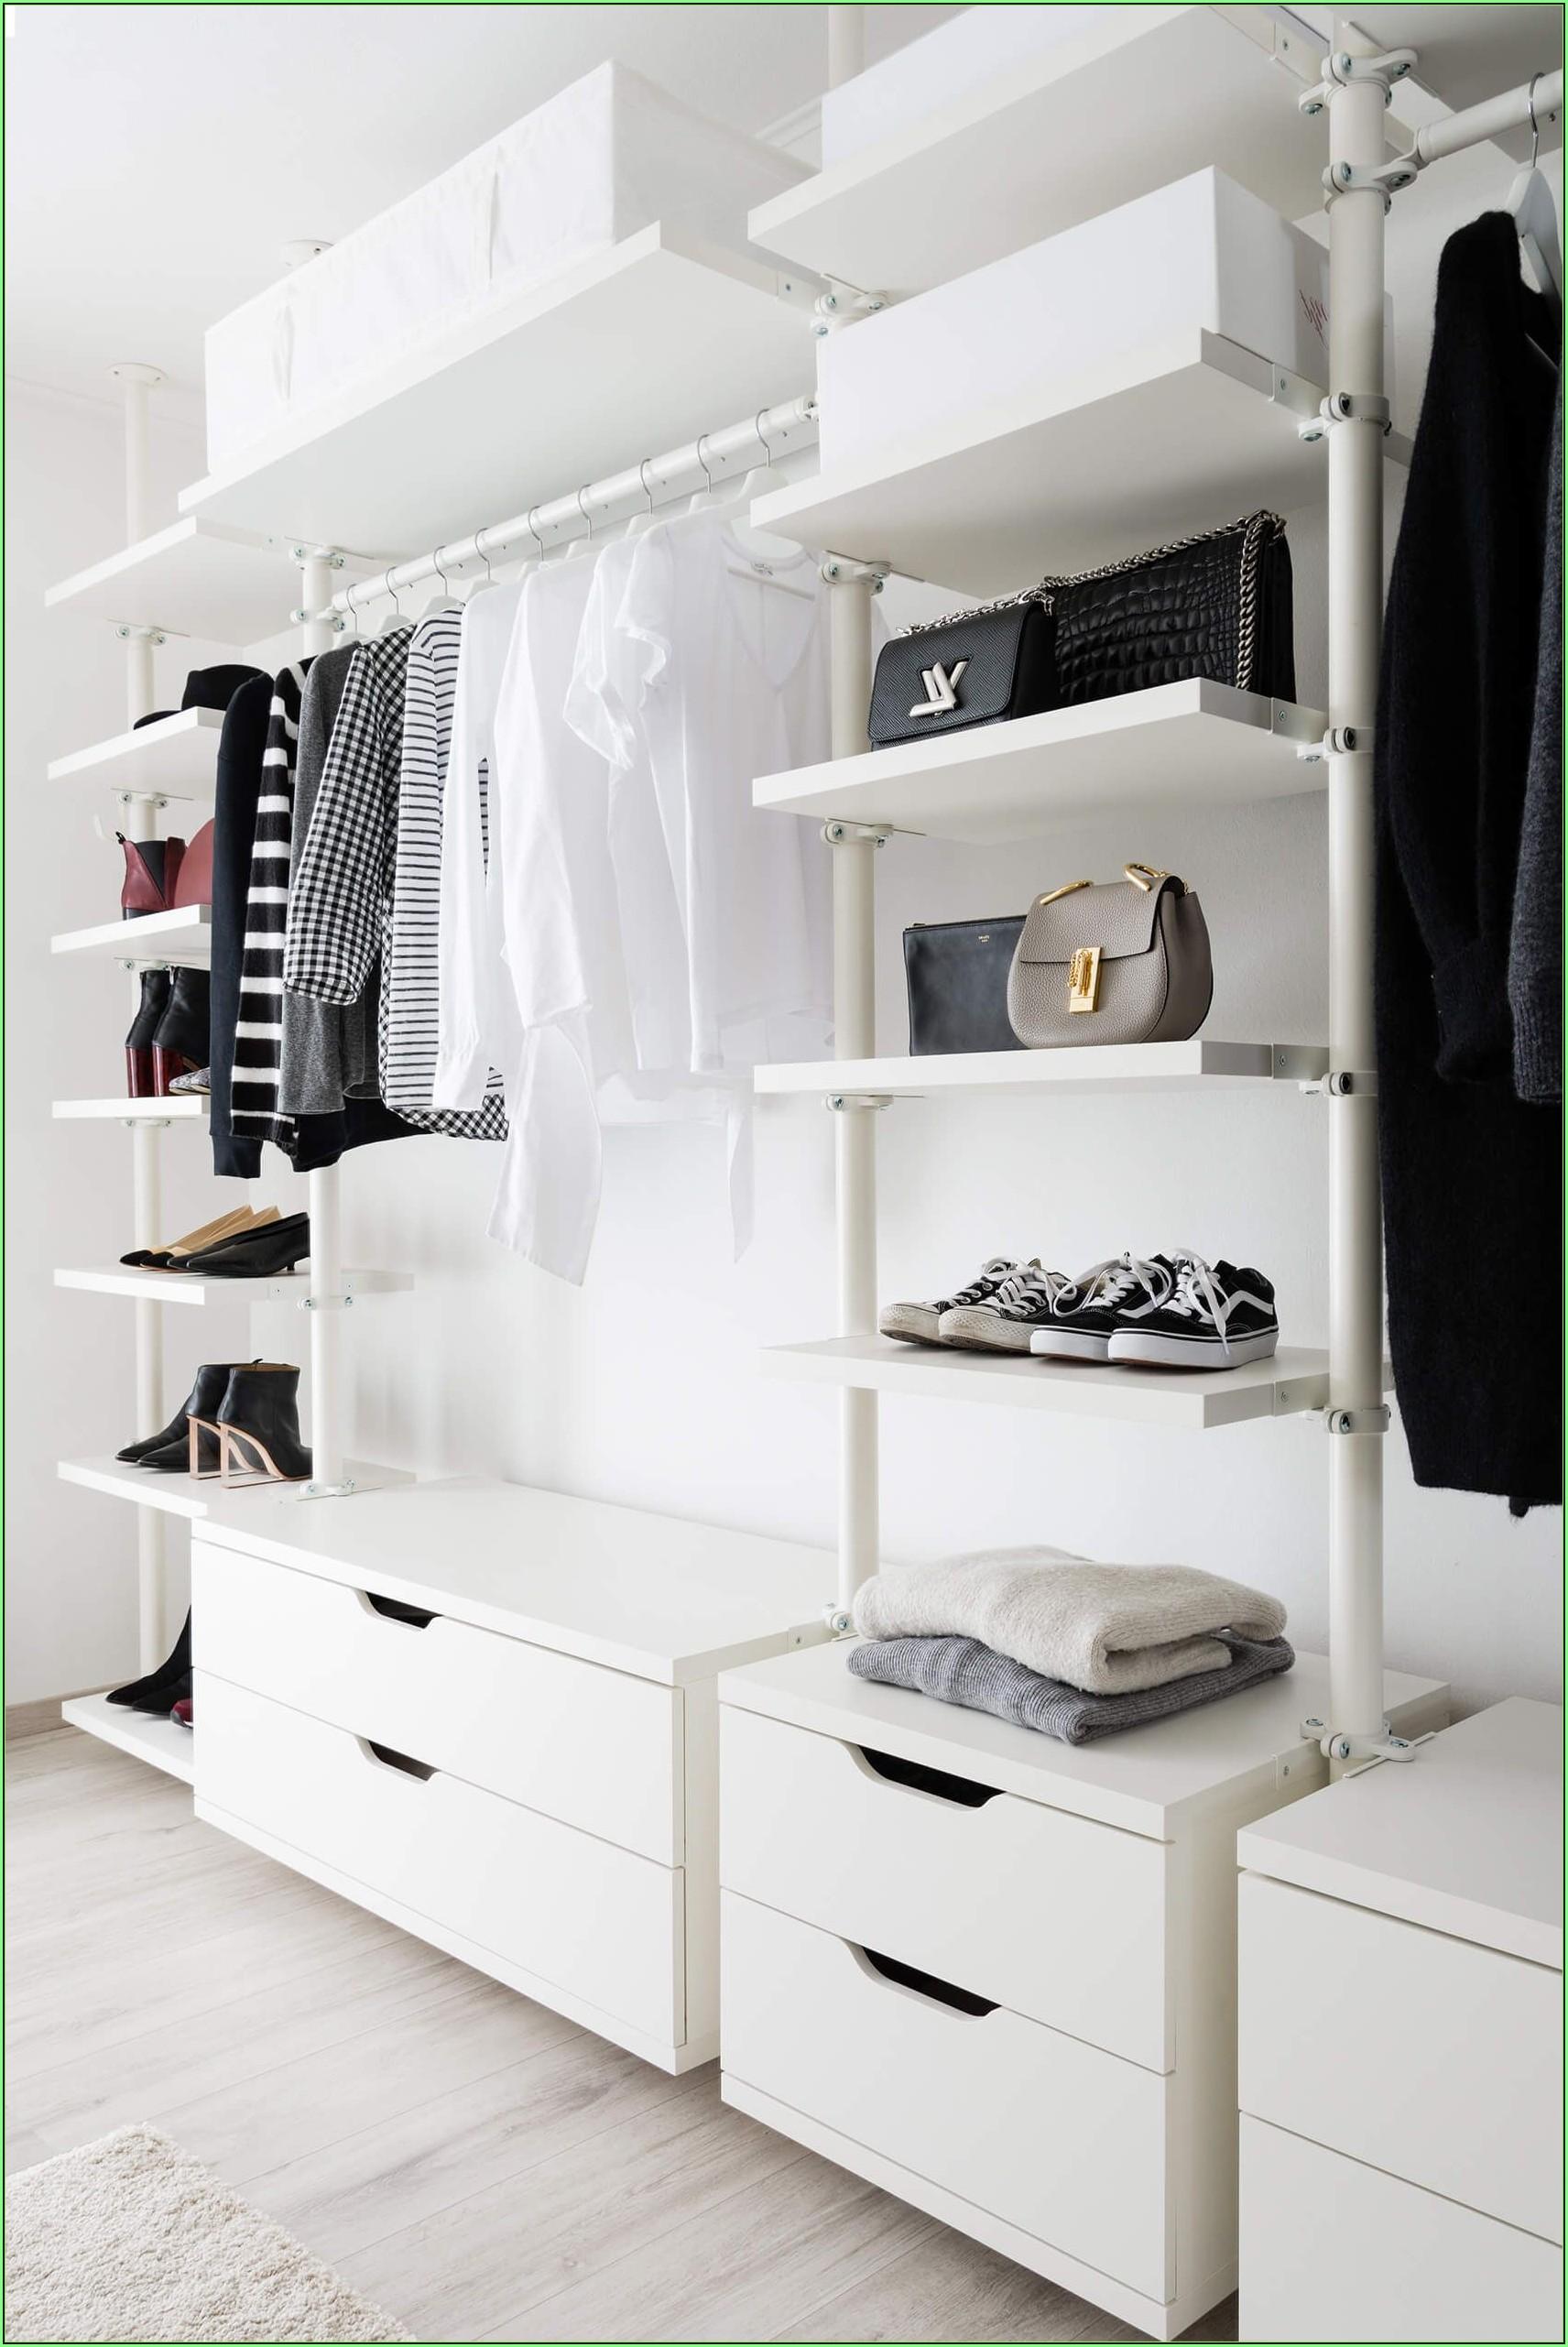 Ikea Regalsystem Ankleidezimmer